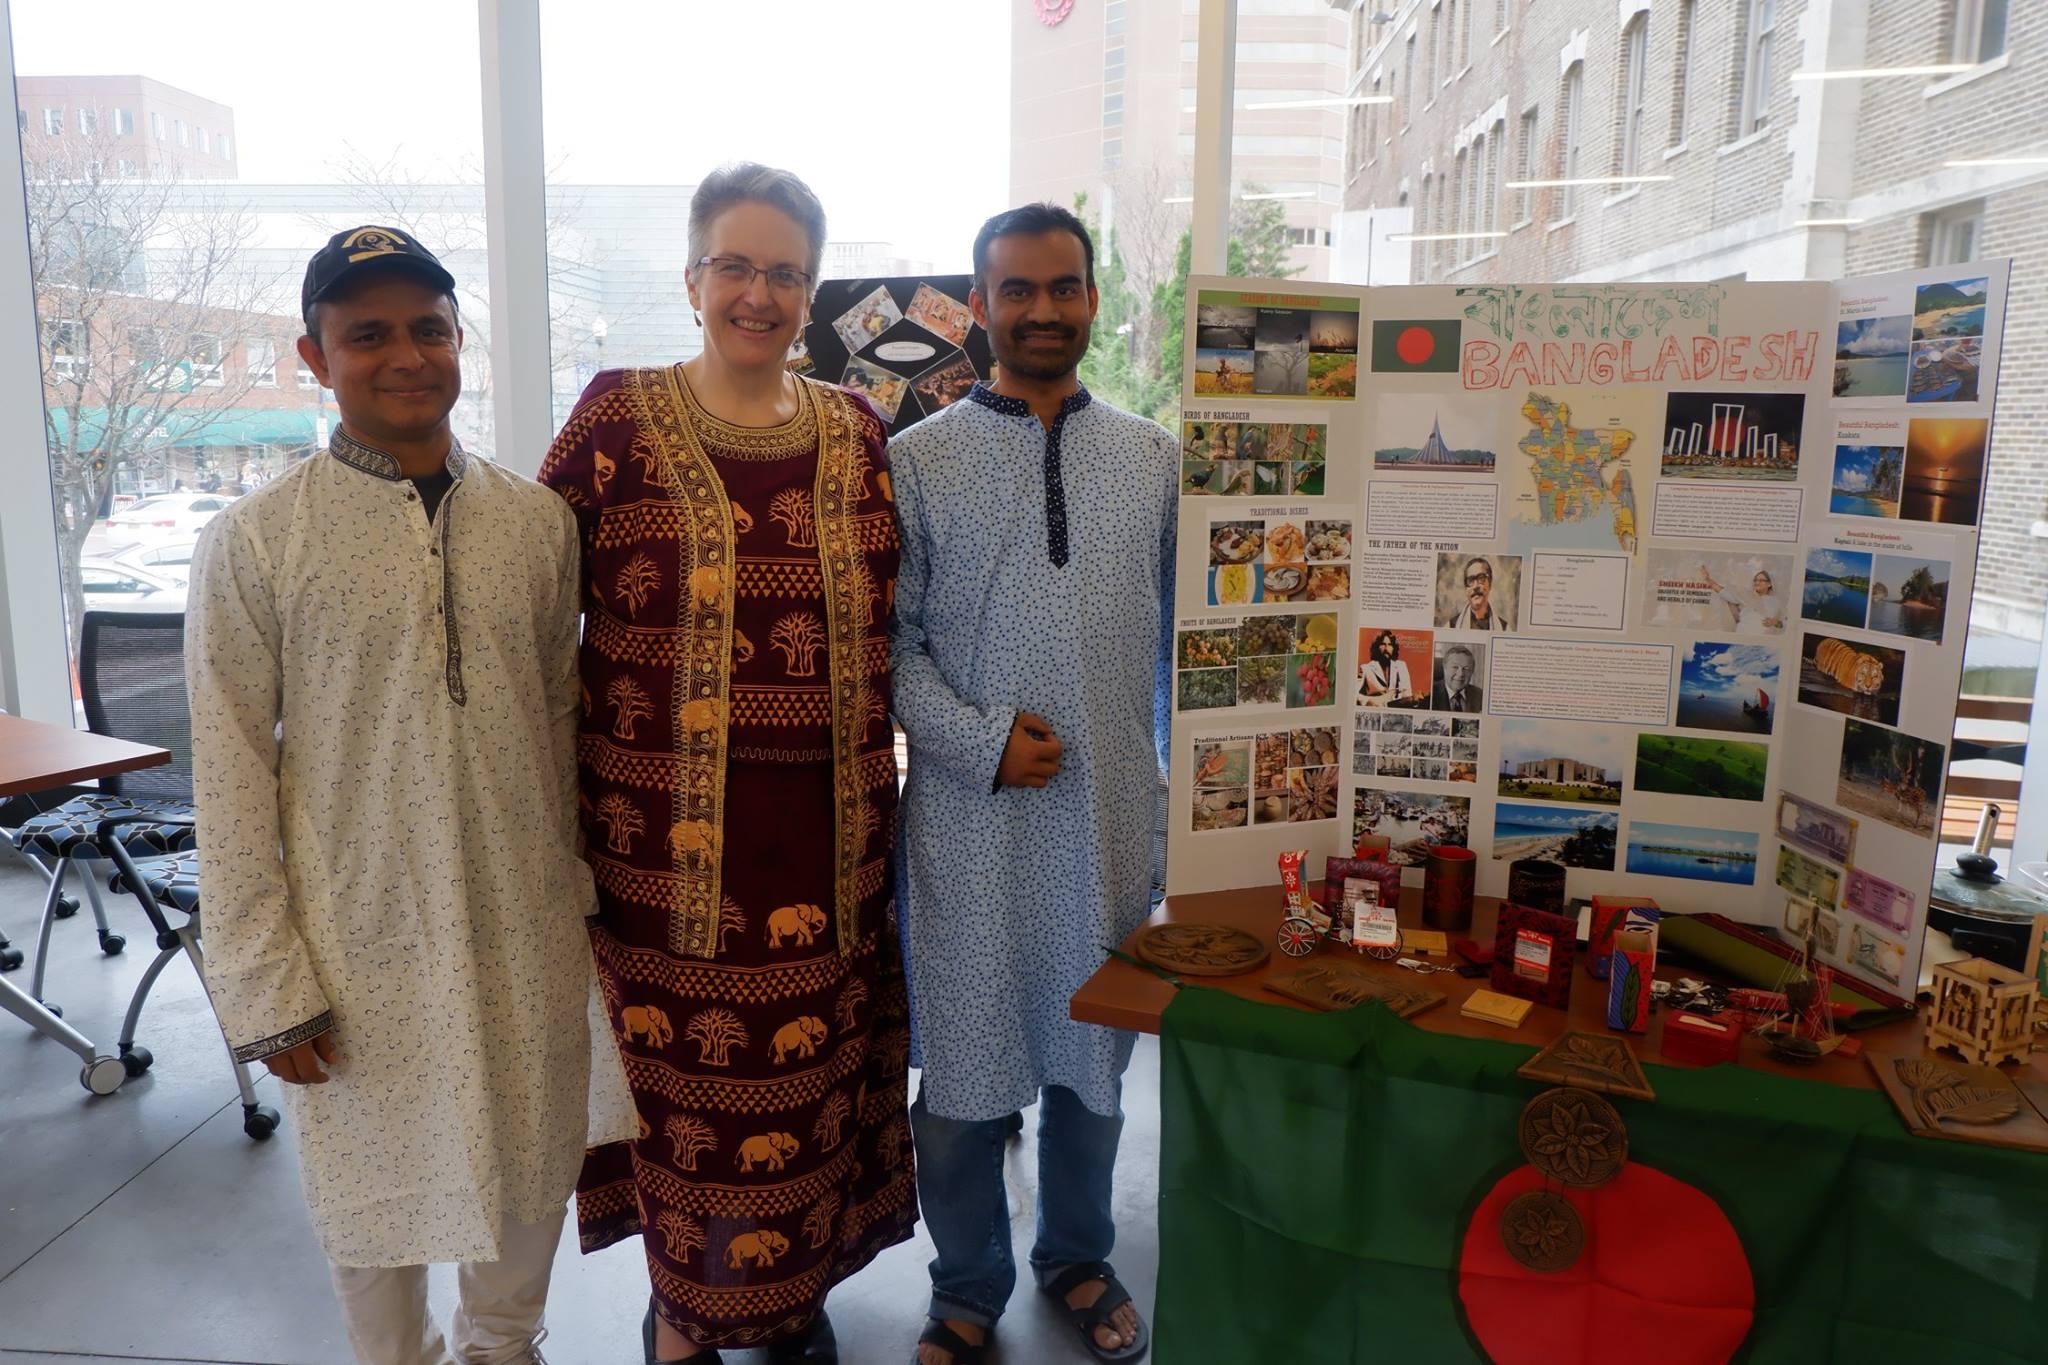 Dean Masingila with Fulbright DAI scholars